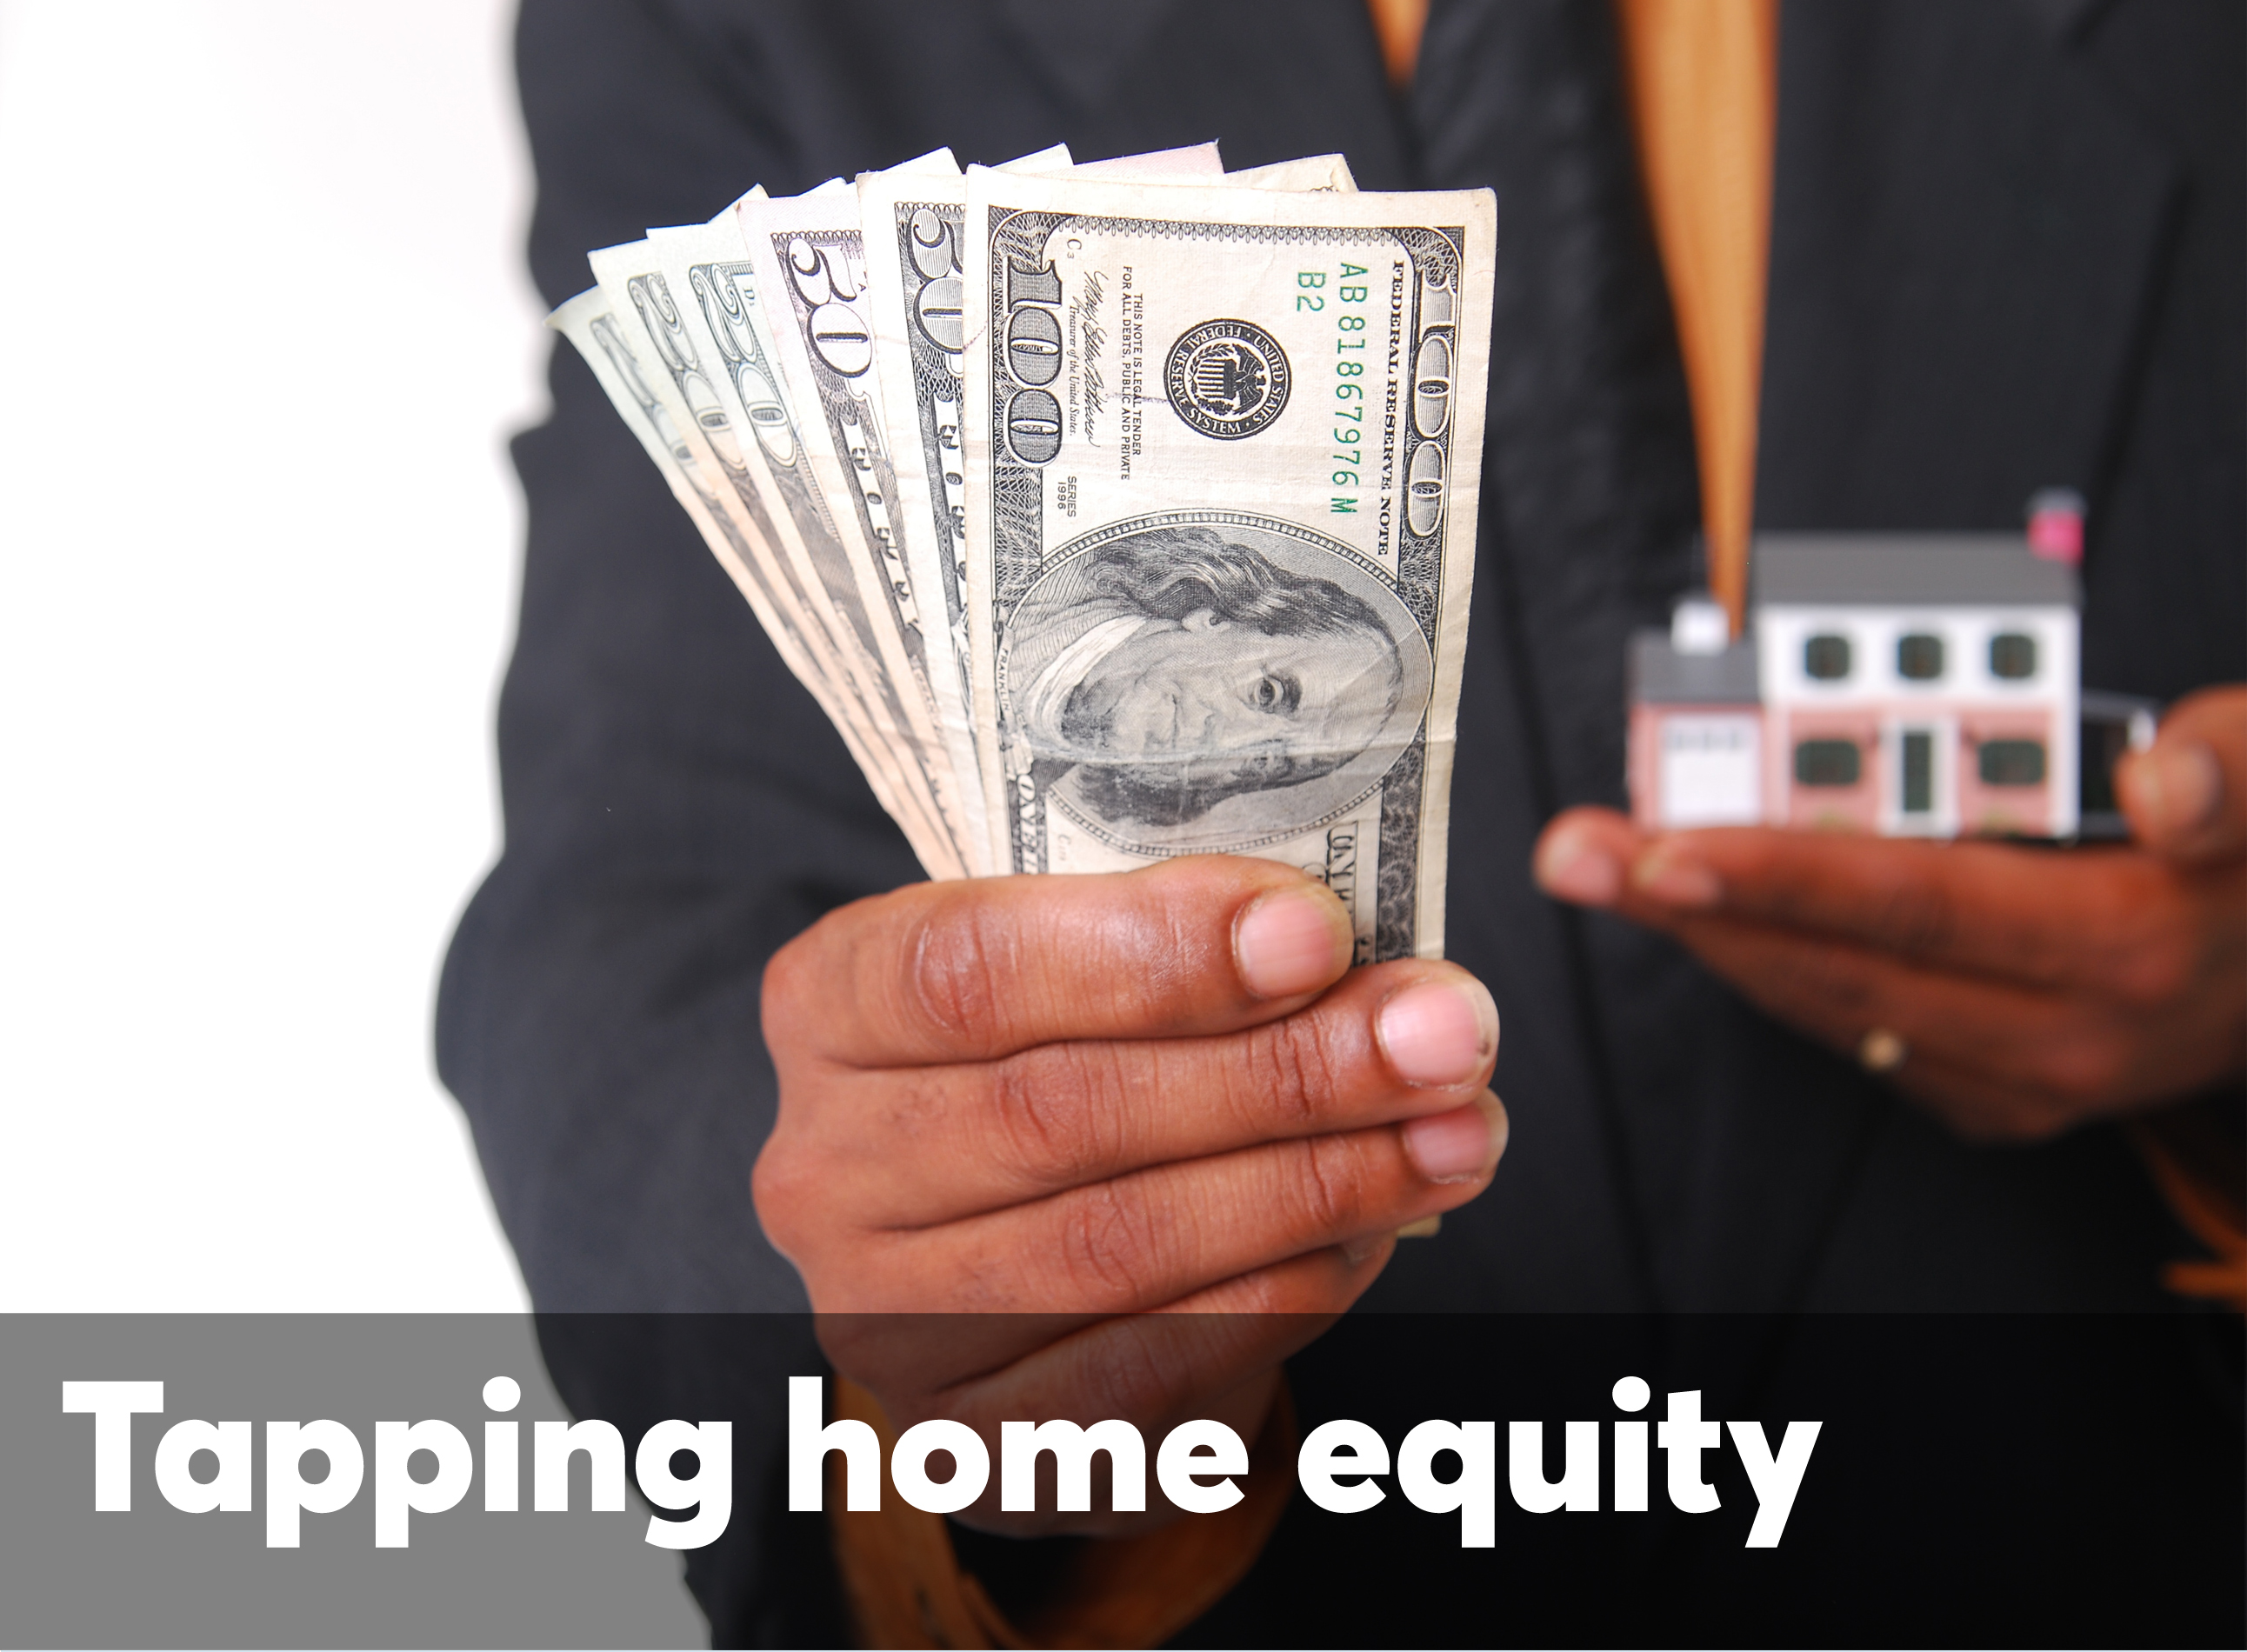 https://assets.sourcemedia.com/17/e1/3baf67b34a6b977786780074a5f7/nmn062518-cover-home-equity.jpg